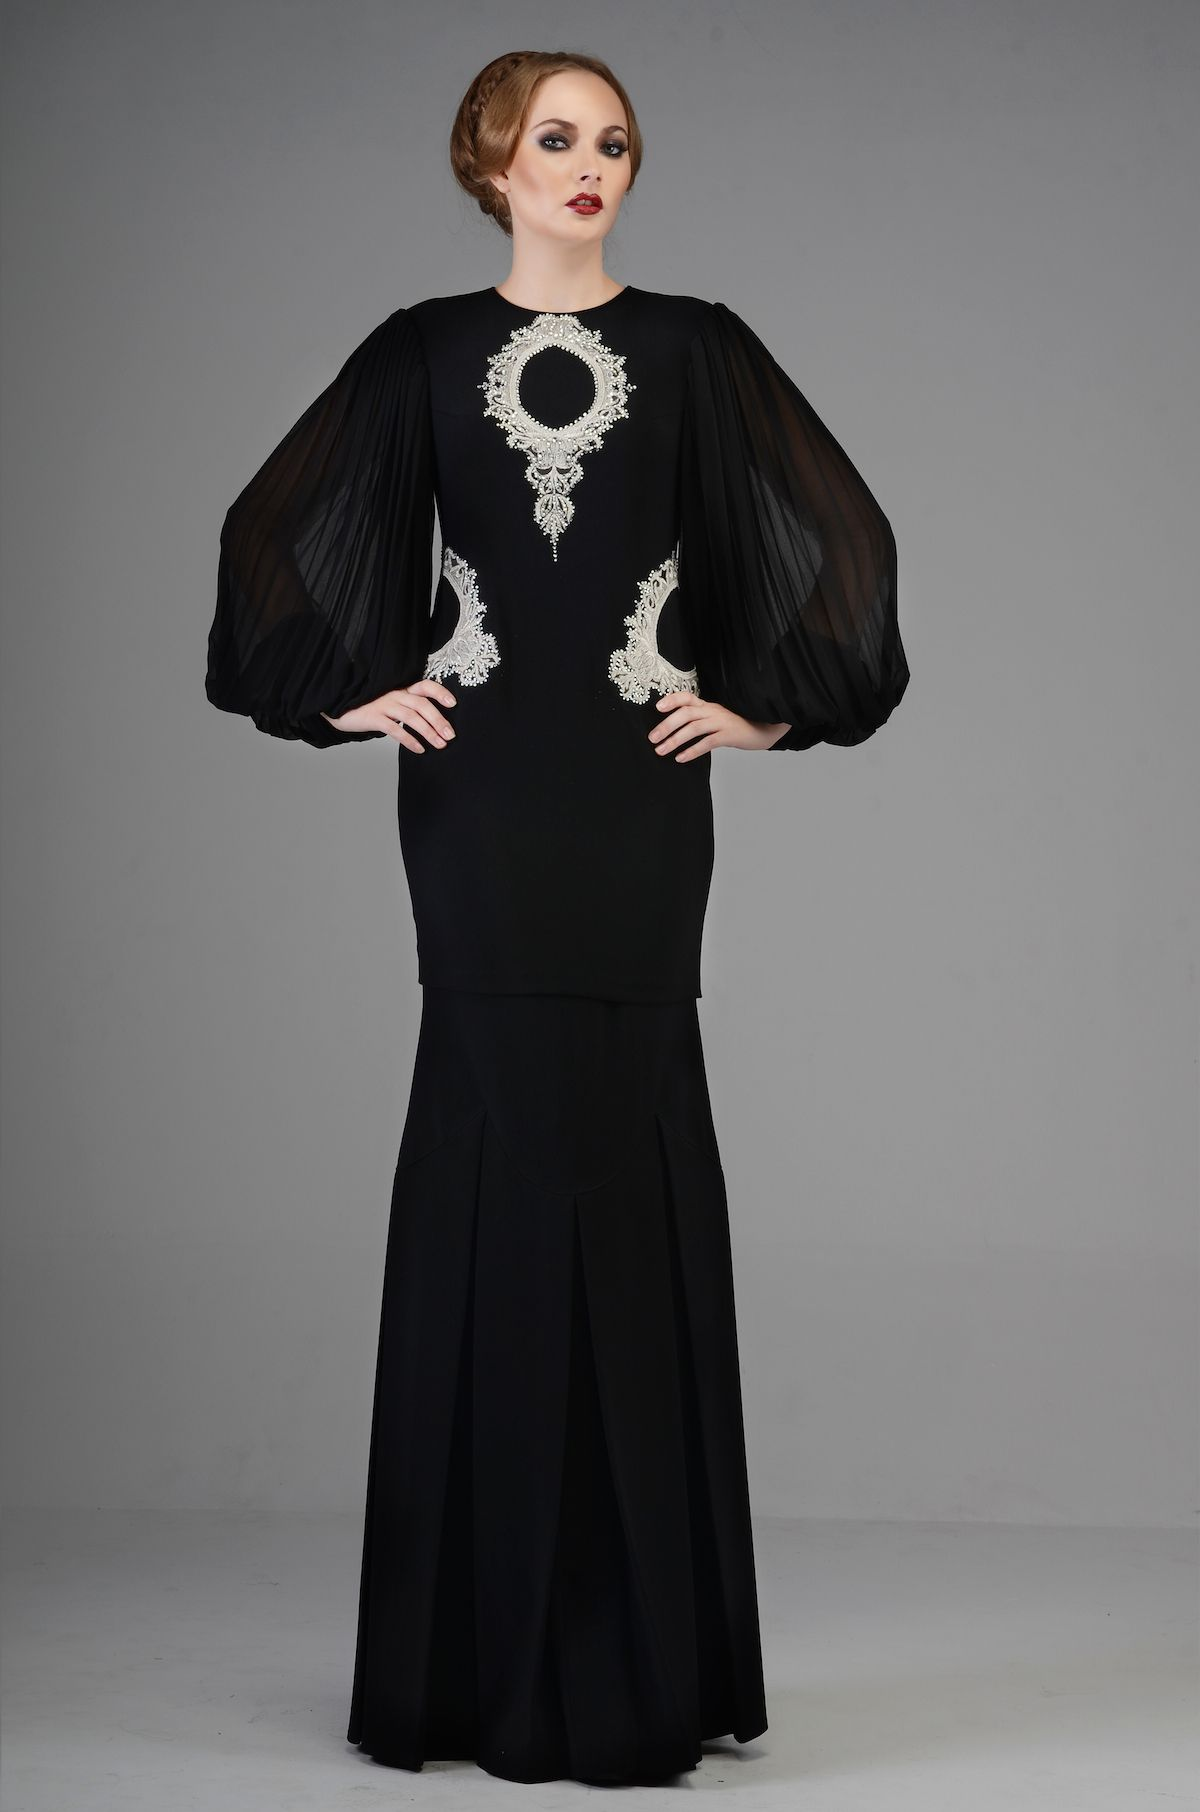 Highness Raya look 7 by Rizman Ruzaini | Kebaya & Baju ...